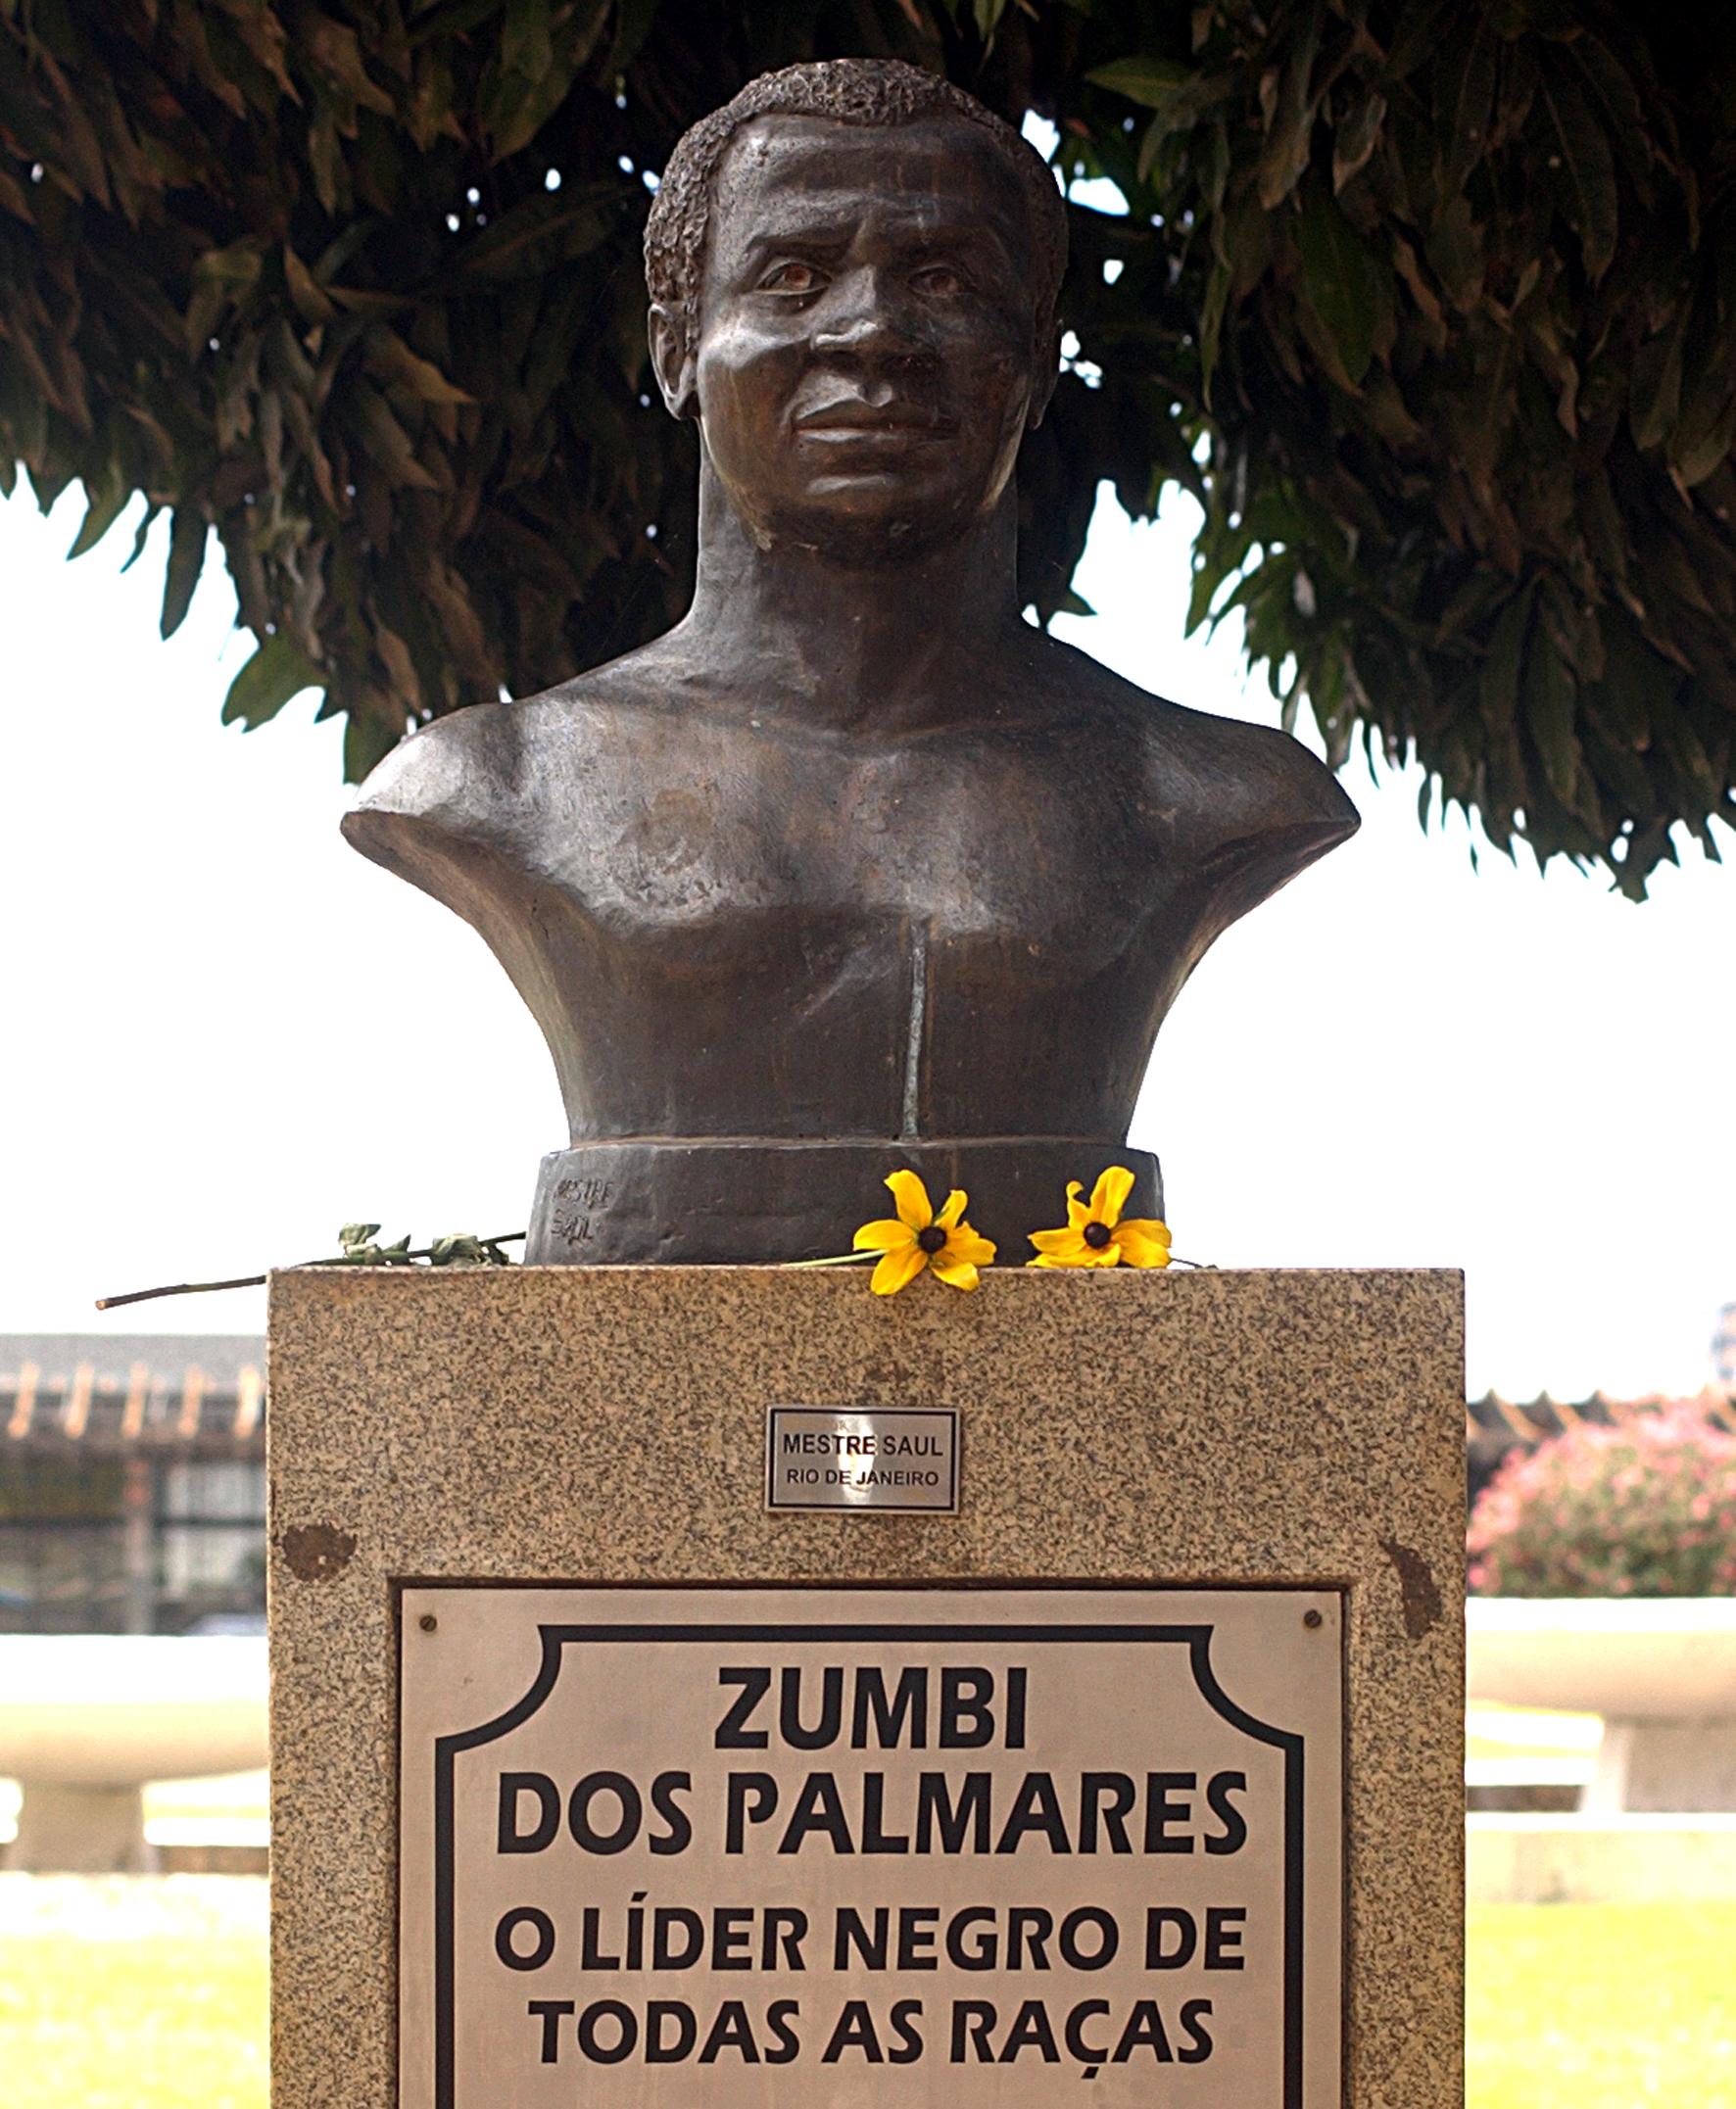 Commemoration statue of Zumbi